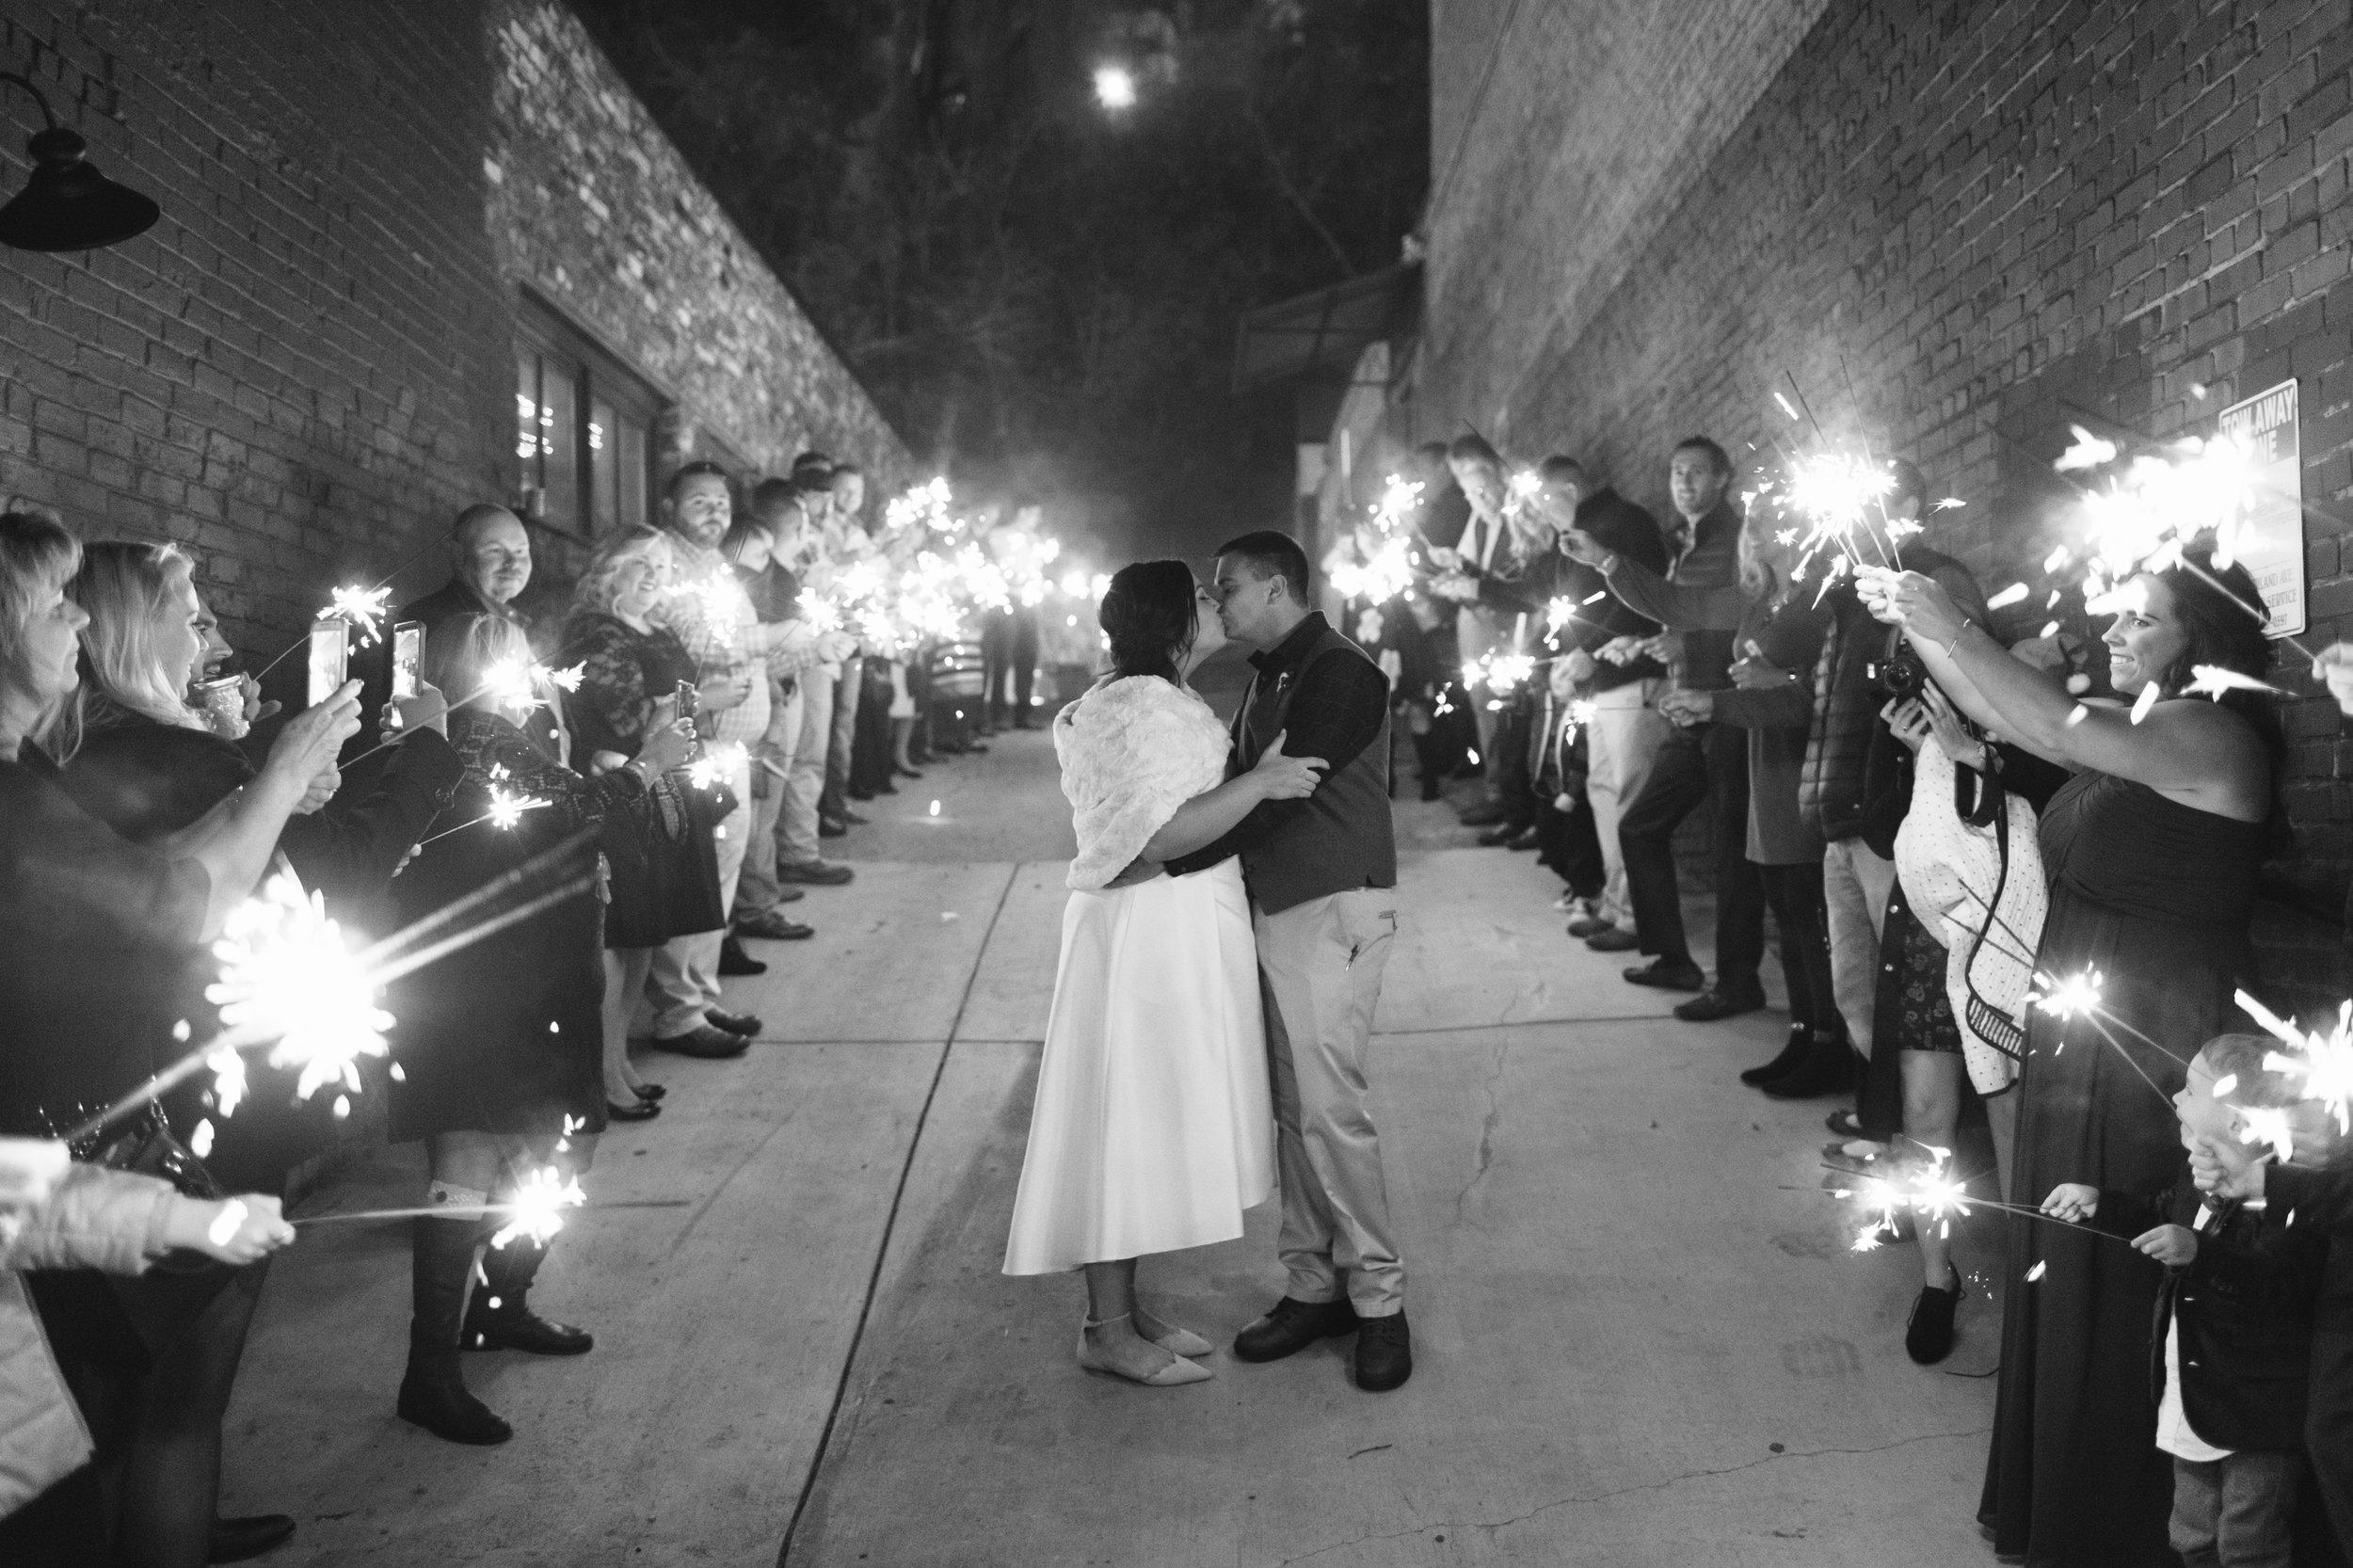 Lauren_Jeremy_Standard_Wedding_Knoxville_Abigail_Malone_Photography_FIlm-616.jpg